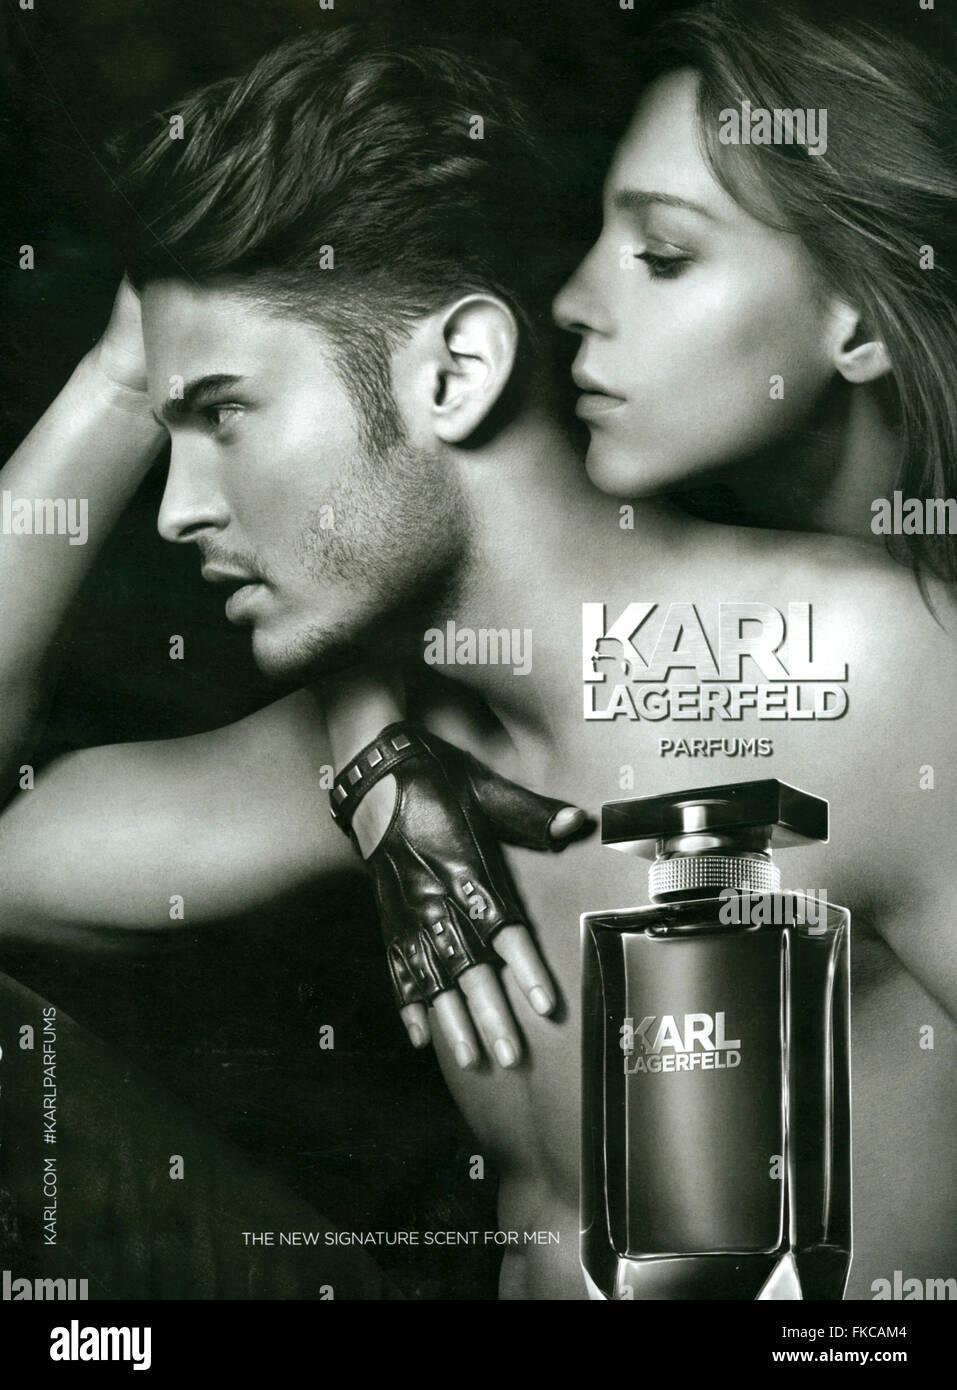 2000s UK Karl Lagerfeld Magazine Advert - Stock Image